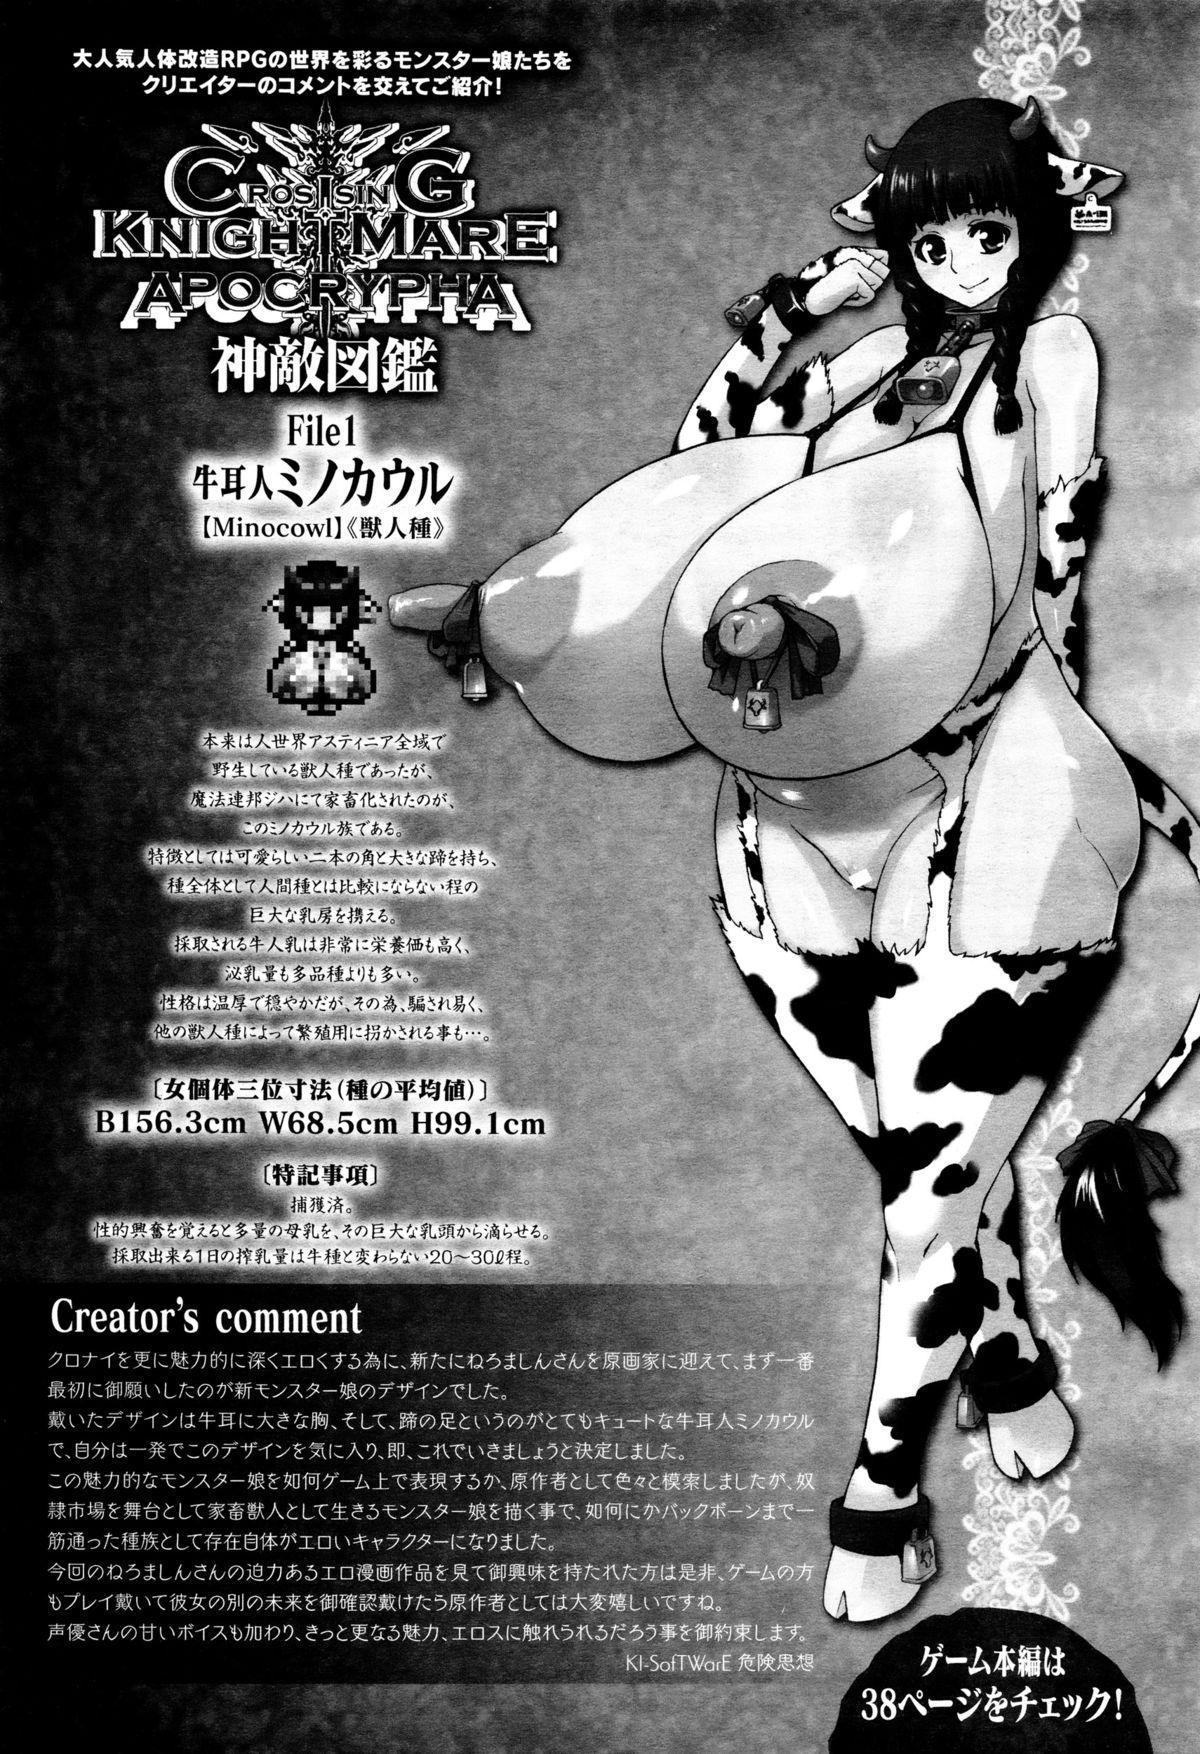 [Neromashin] CrossinG KnighTMarE ApocryphA ~Niku no Rougoku~ | Knightmare Apocrypha ~Prison of Flesh~ (COMIC Unreal 2015-12 Vol. 58) [English] [desudesu] 20